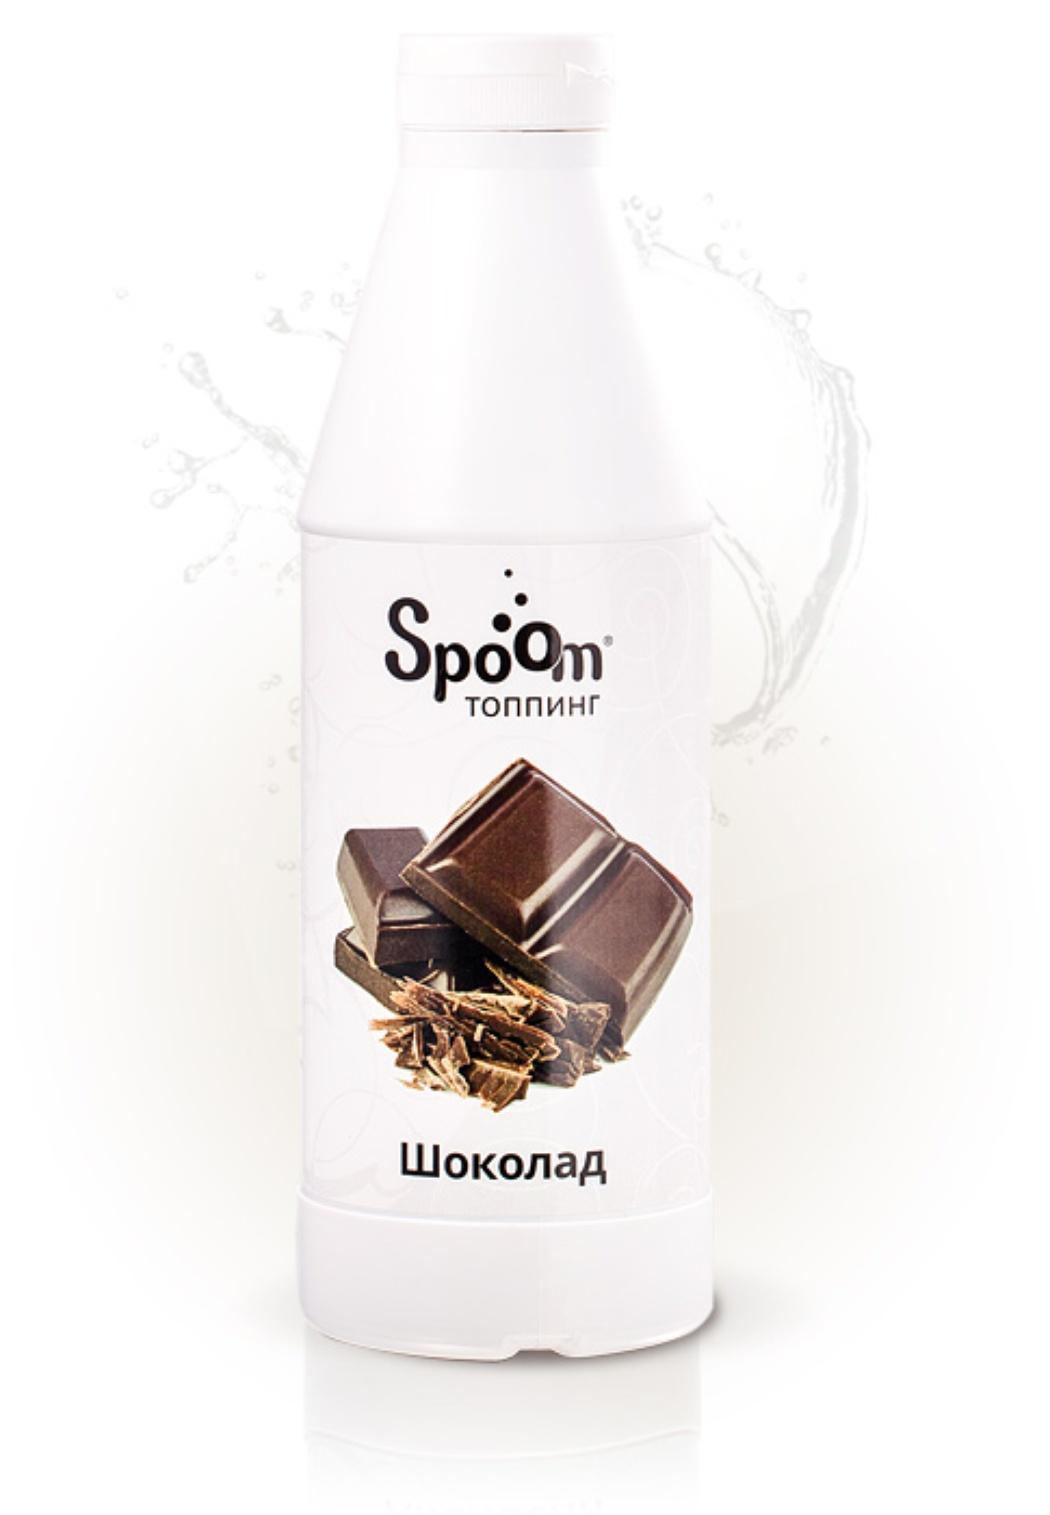 Топпинг Spoom Шоколад